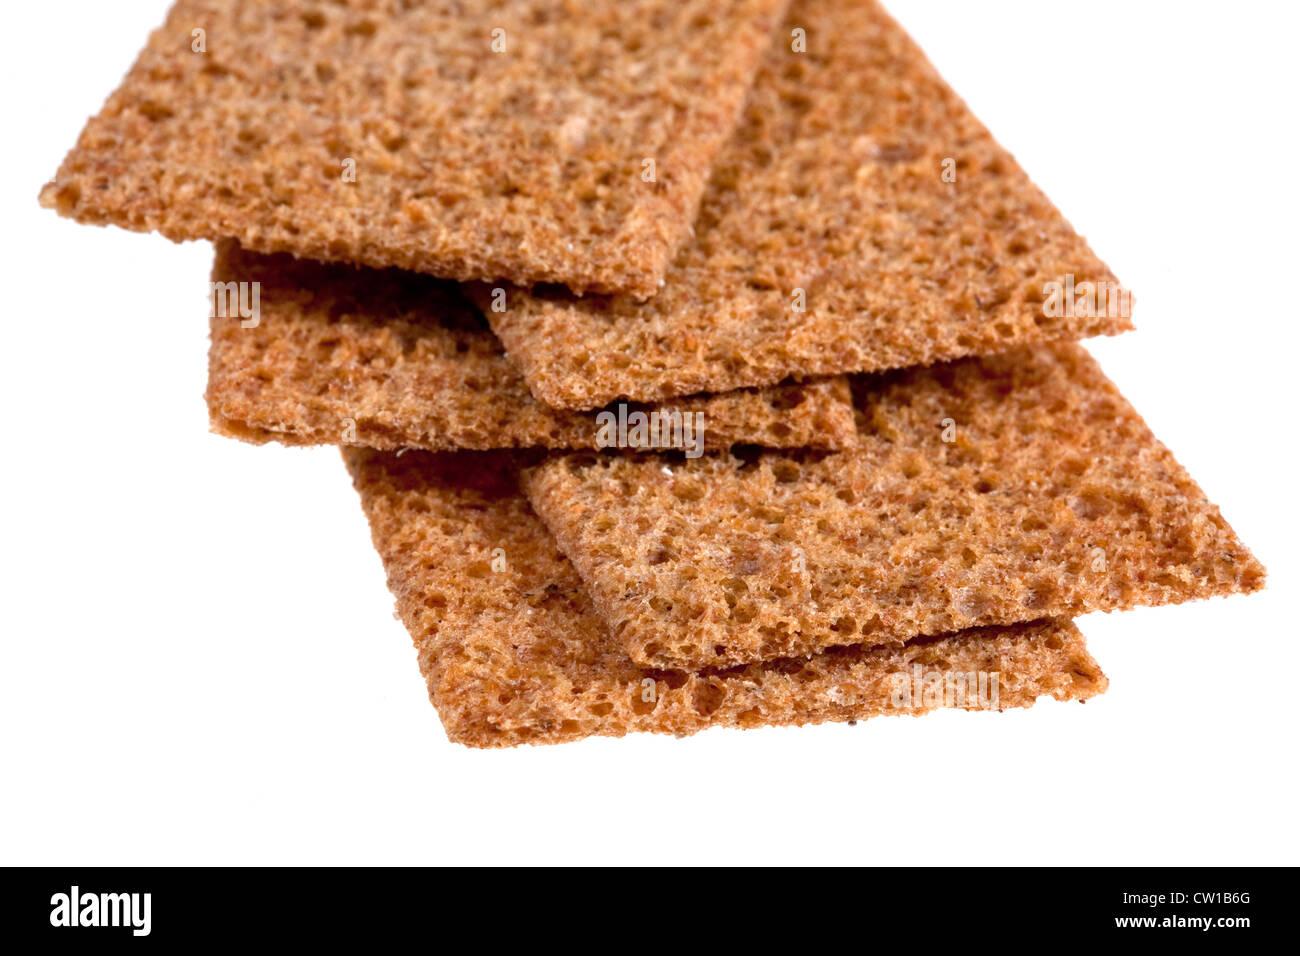 thin crispbreads close-up isolated on white - Stock Image